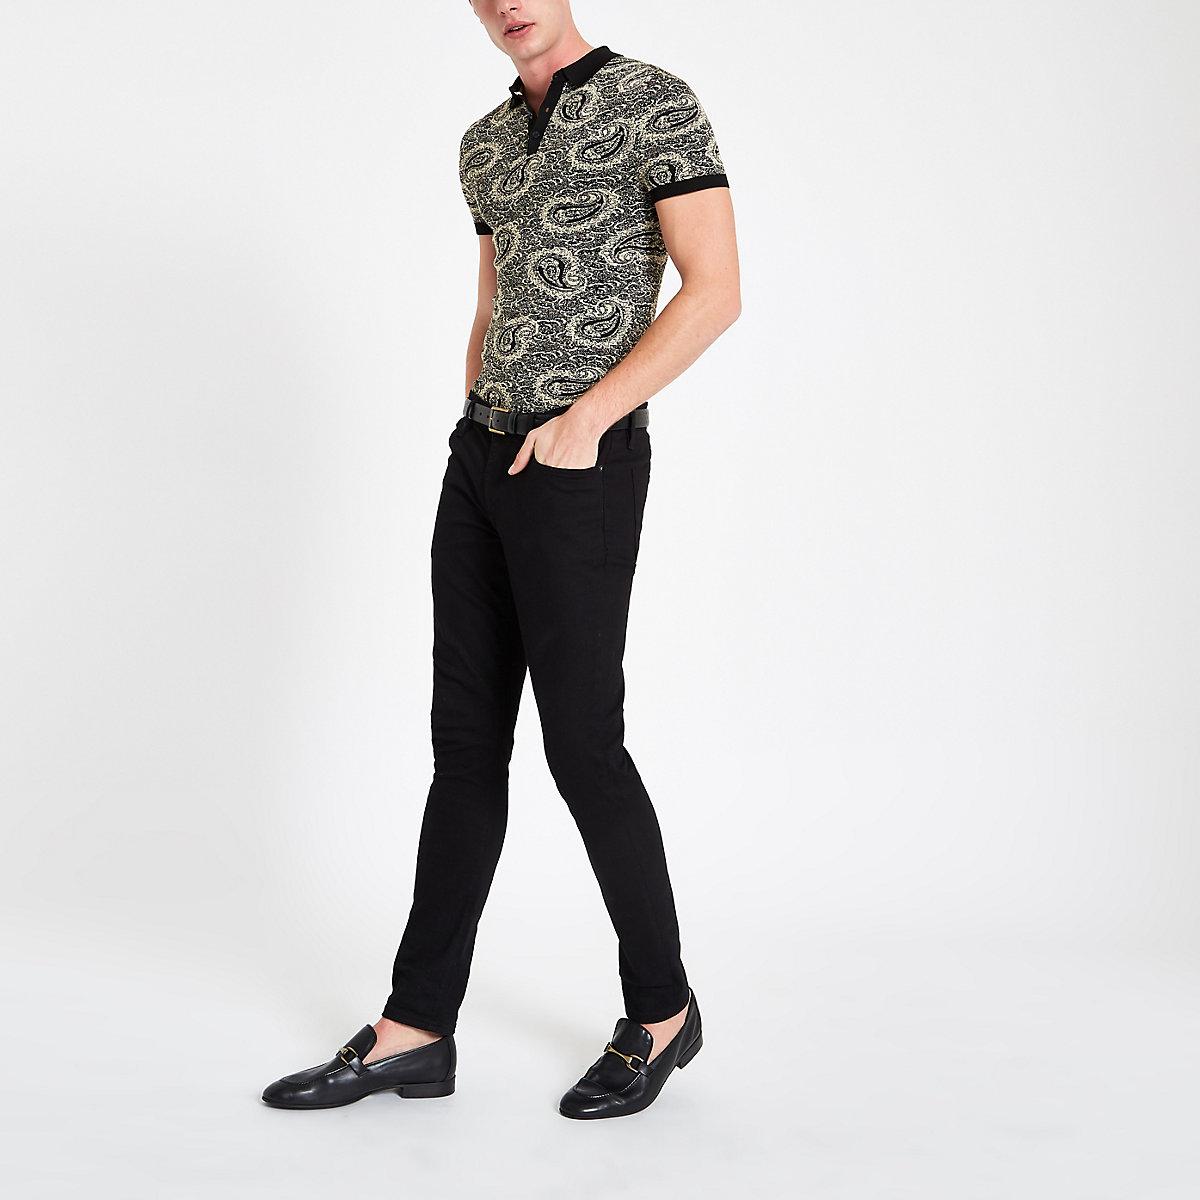 Schwarzes Slim Fit Polohemd mit Paisley-Muster